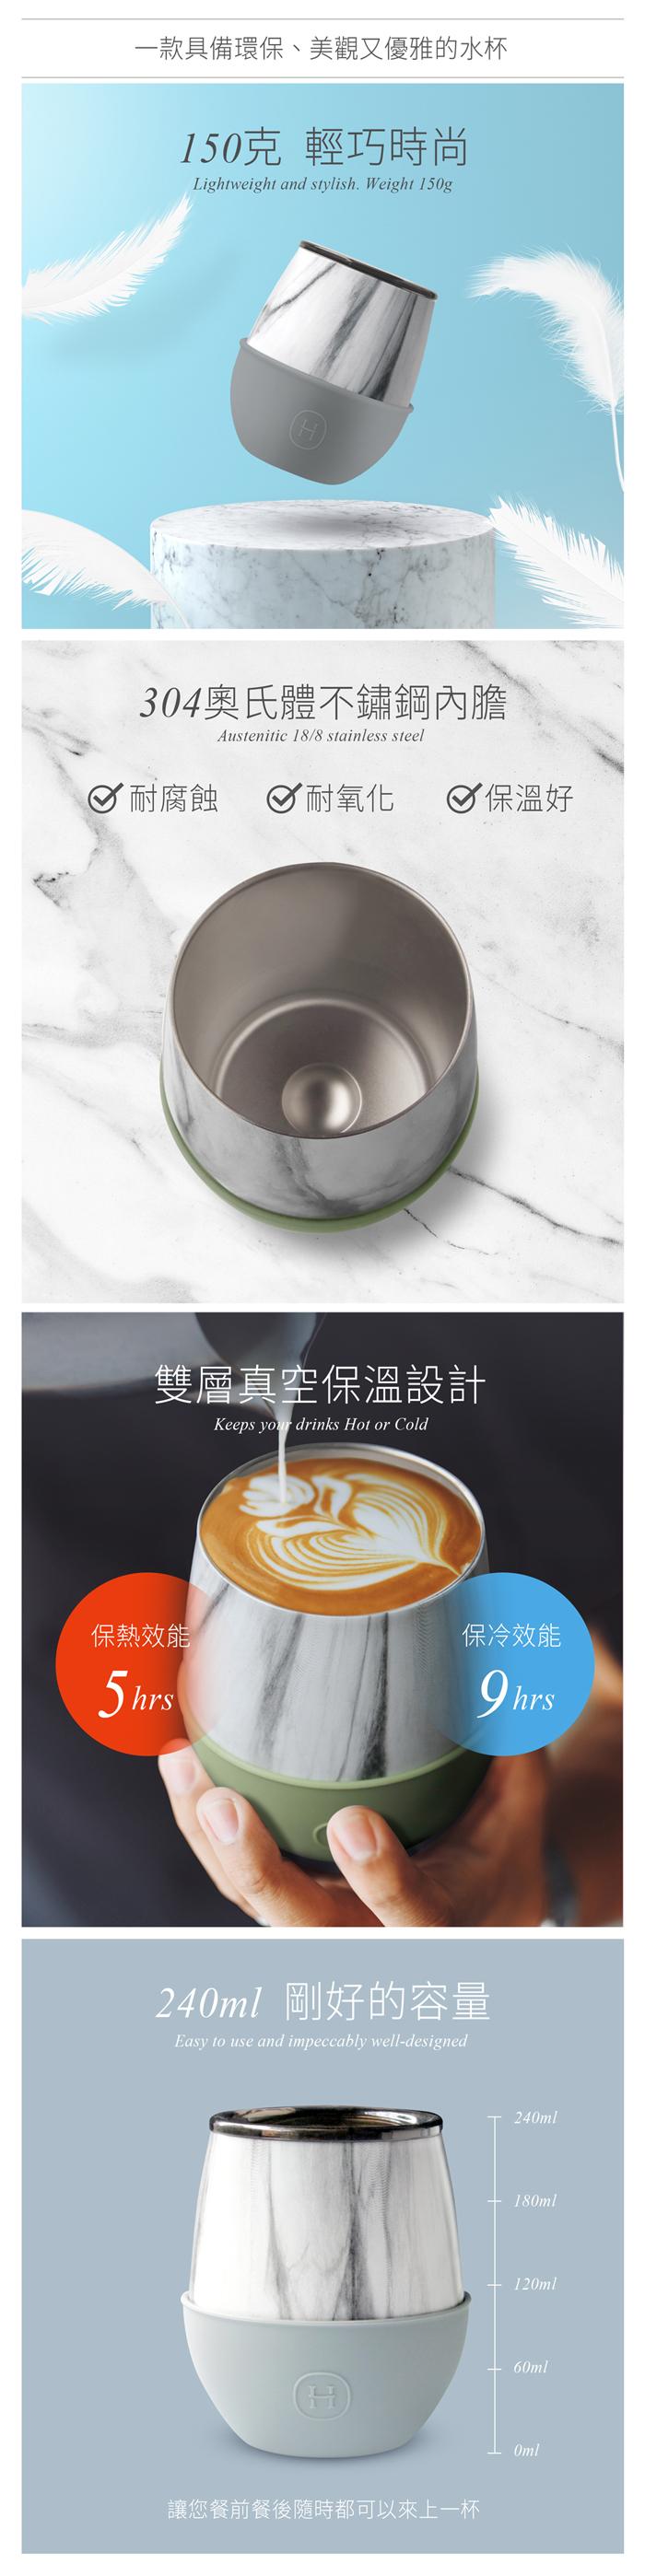 Delicia 大理石蛋型杯4入組 | White Marble Tumblers (4pcs)